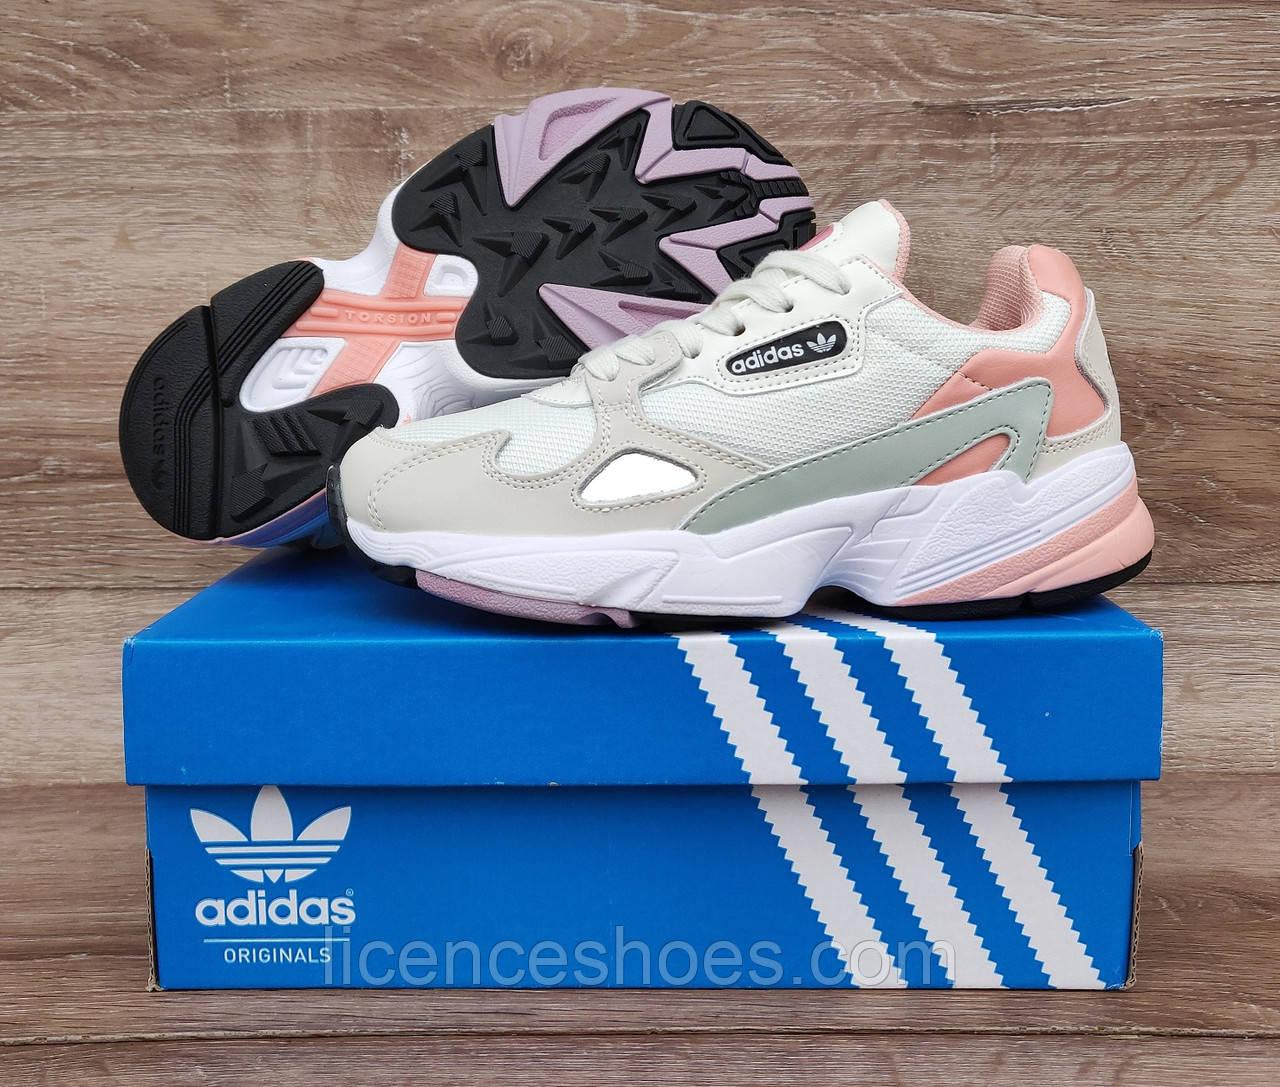 Женские кроссовки Adidas Falcon W (WHITE TINT / RAW WHITE / TRACE PINK) EE4149